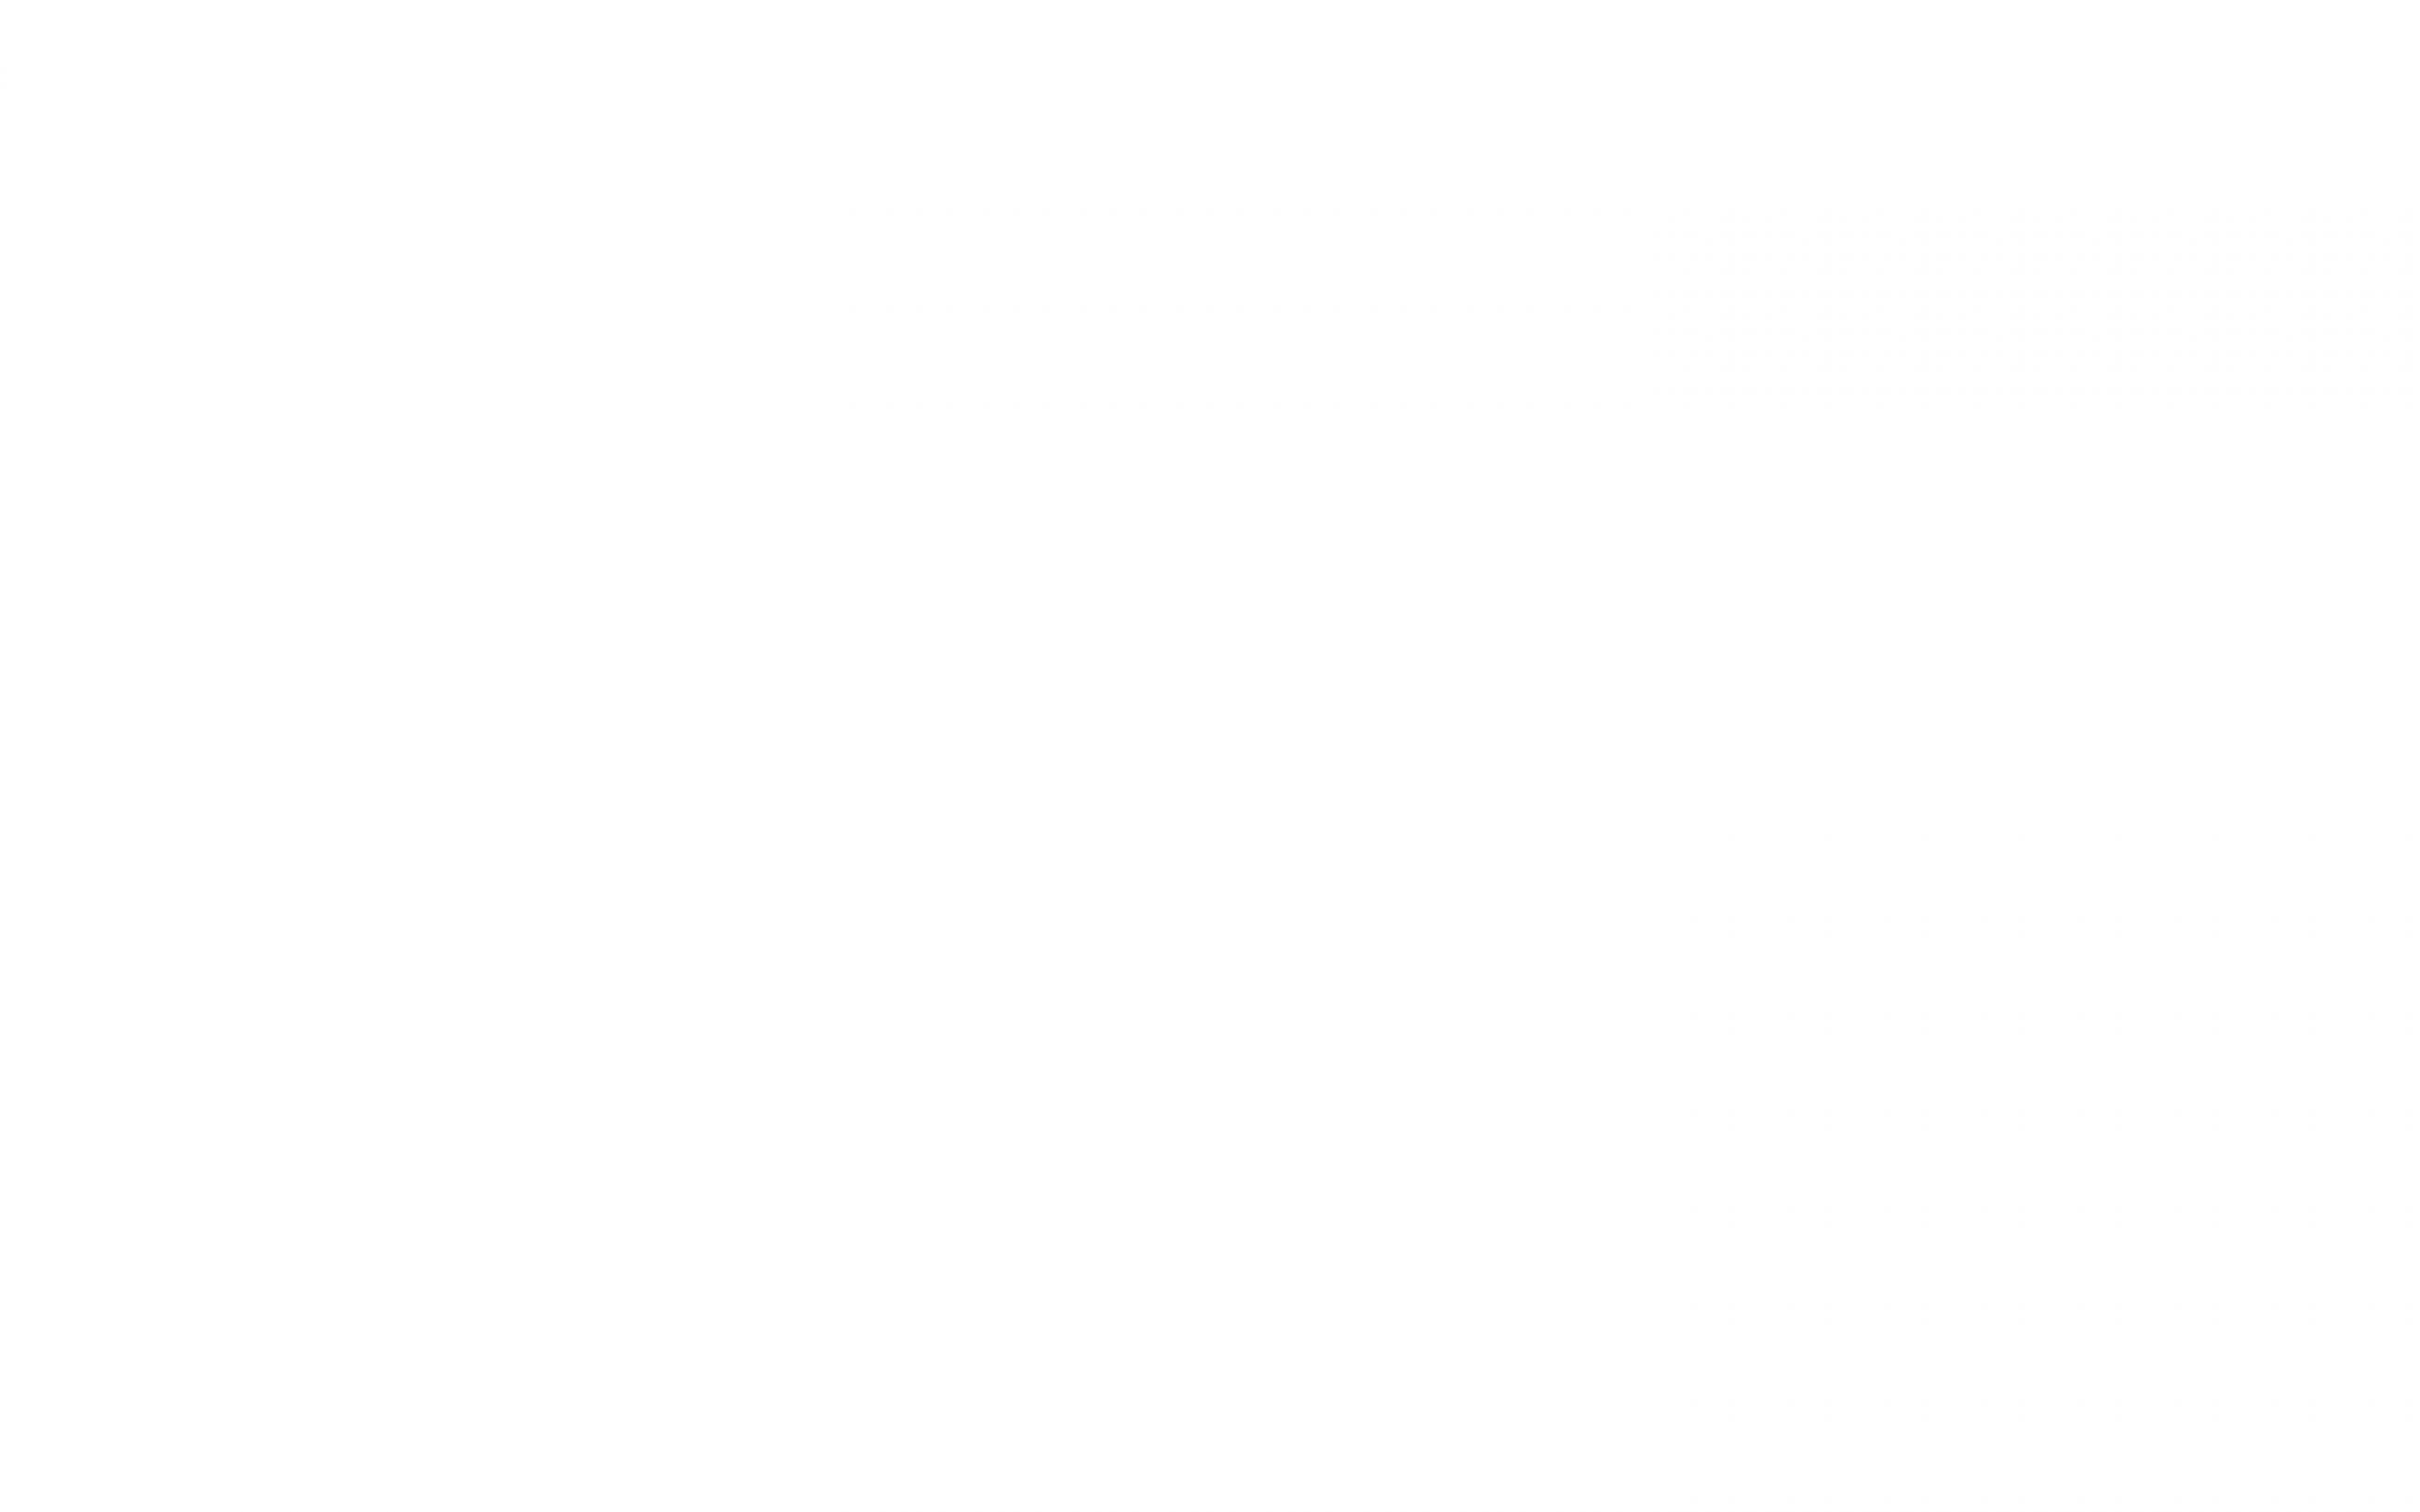 castirondesign.com — Huckle & Goose branding by Cast Iron Studio, 2014.